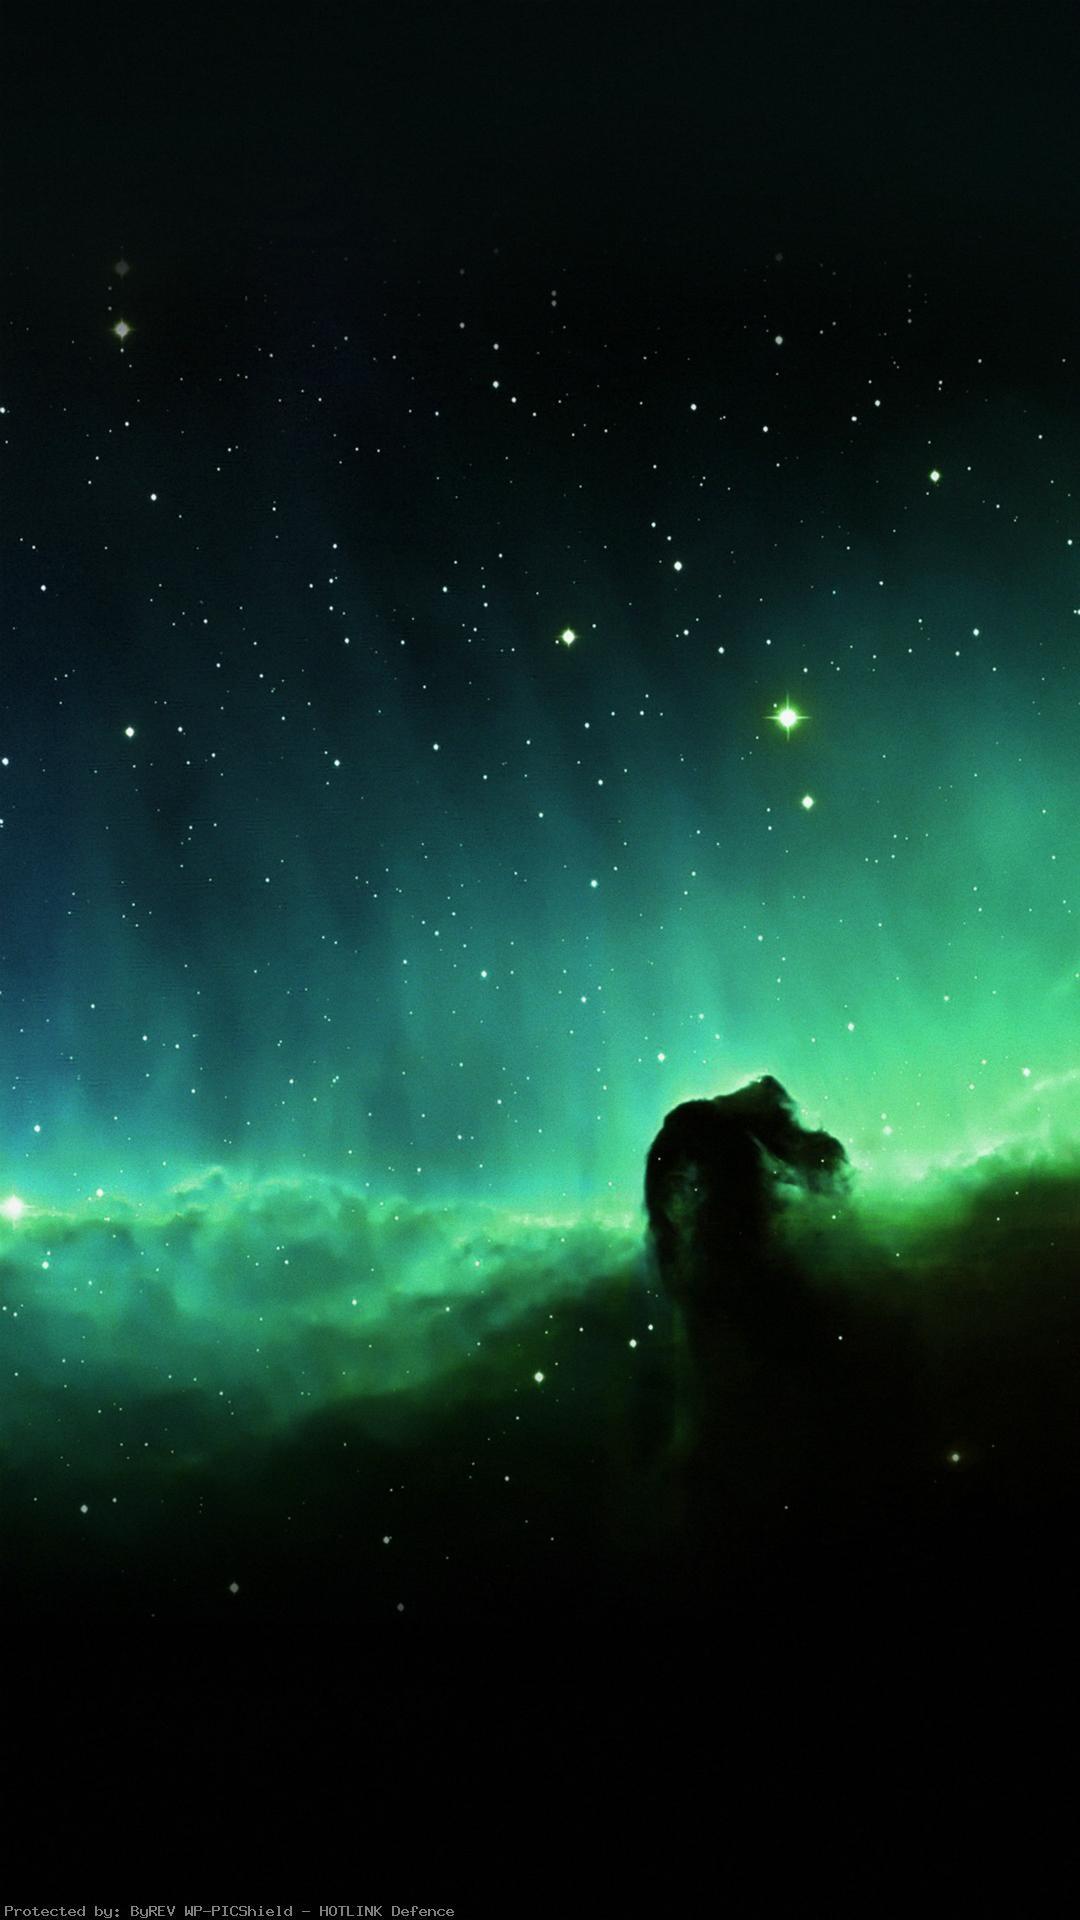 Horse-Head-Blue-Nebula-Sky-Space-Stars-iPhone-